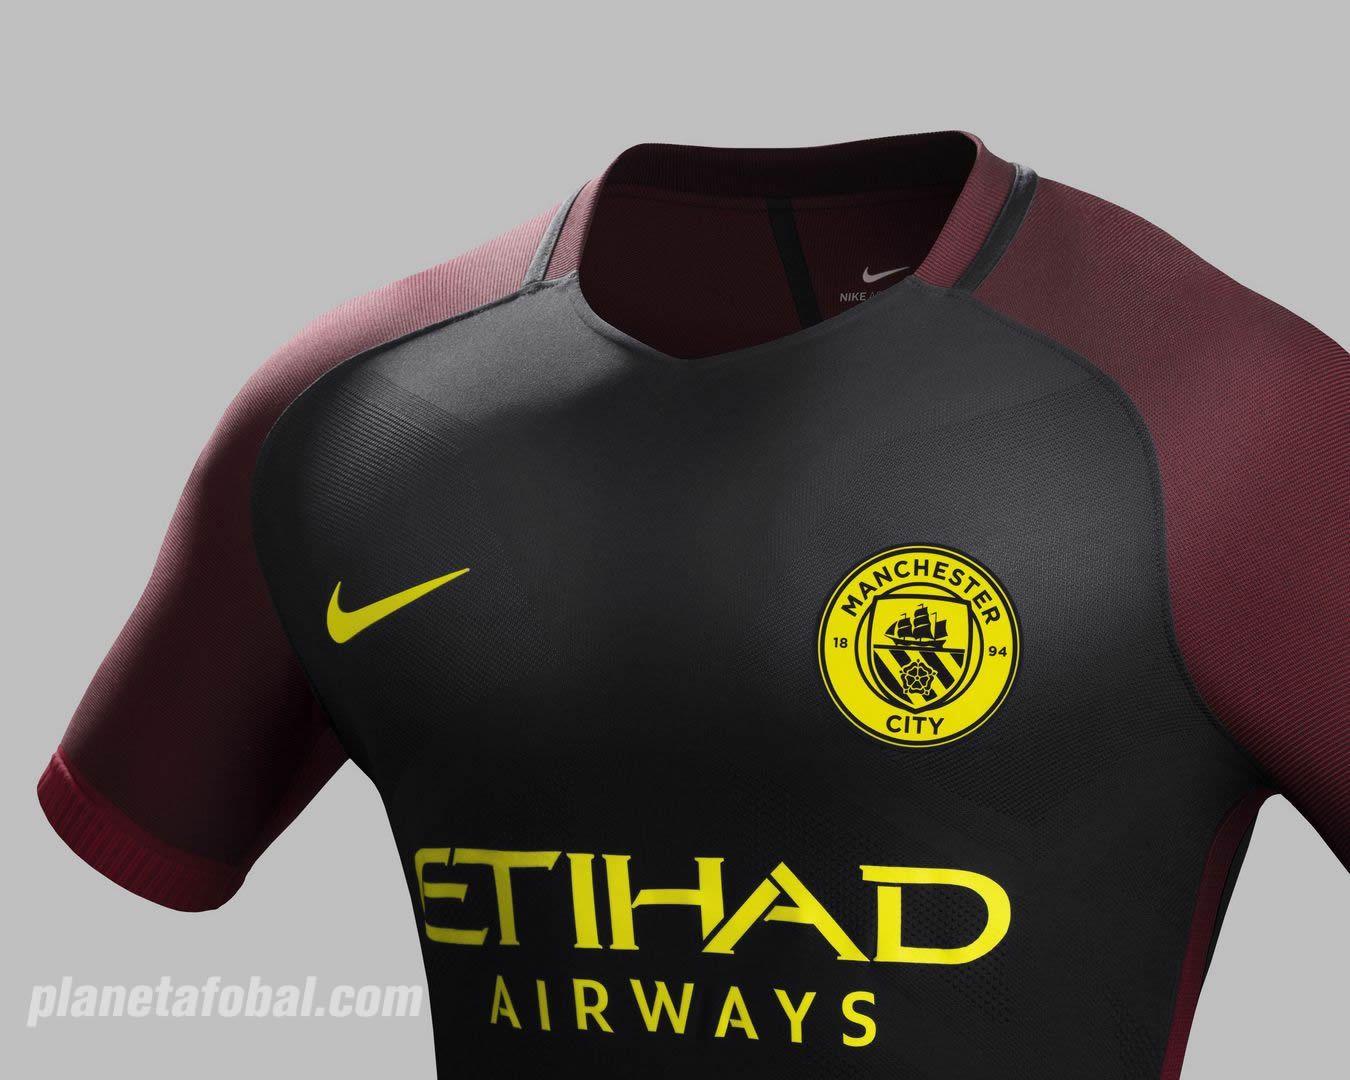 Camiseta suplente Nike del Manchester City 2016/2017   Planeta Fobal